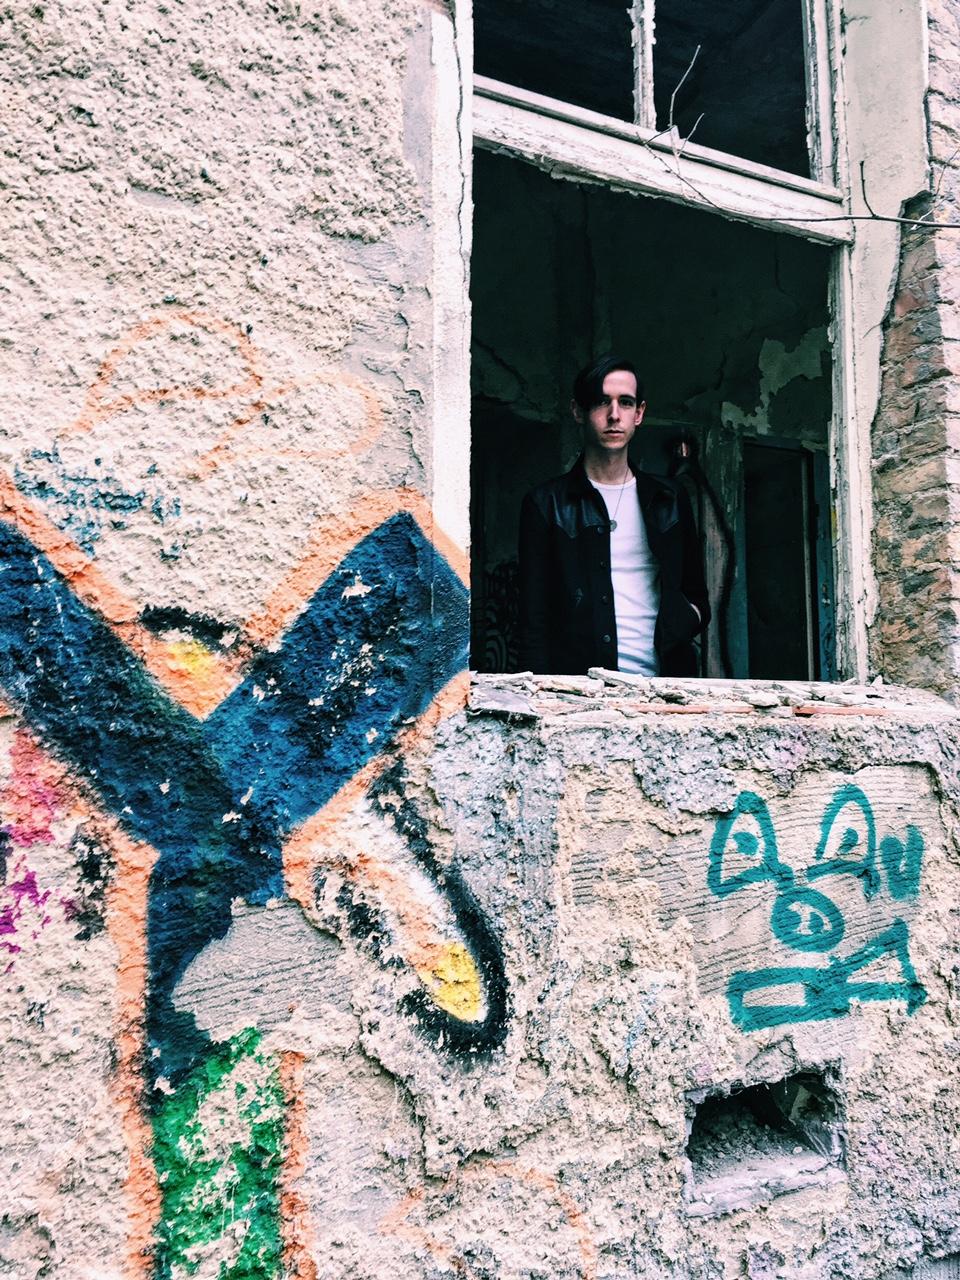 Ruine-Kinderkrankenhaus-Berlin-02